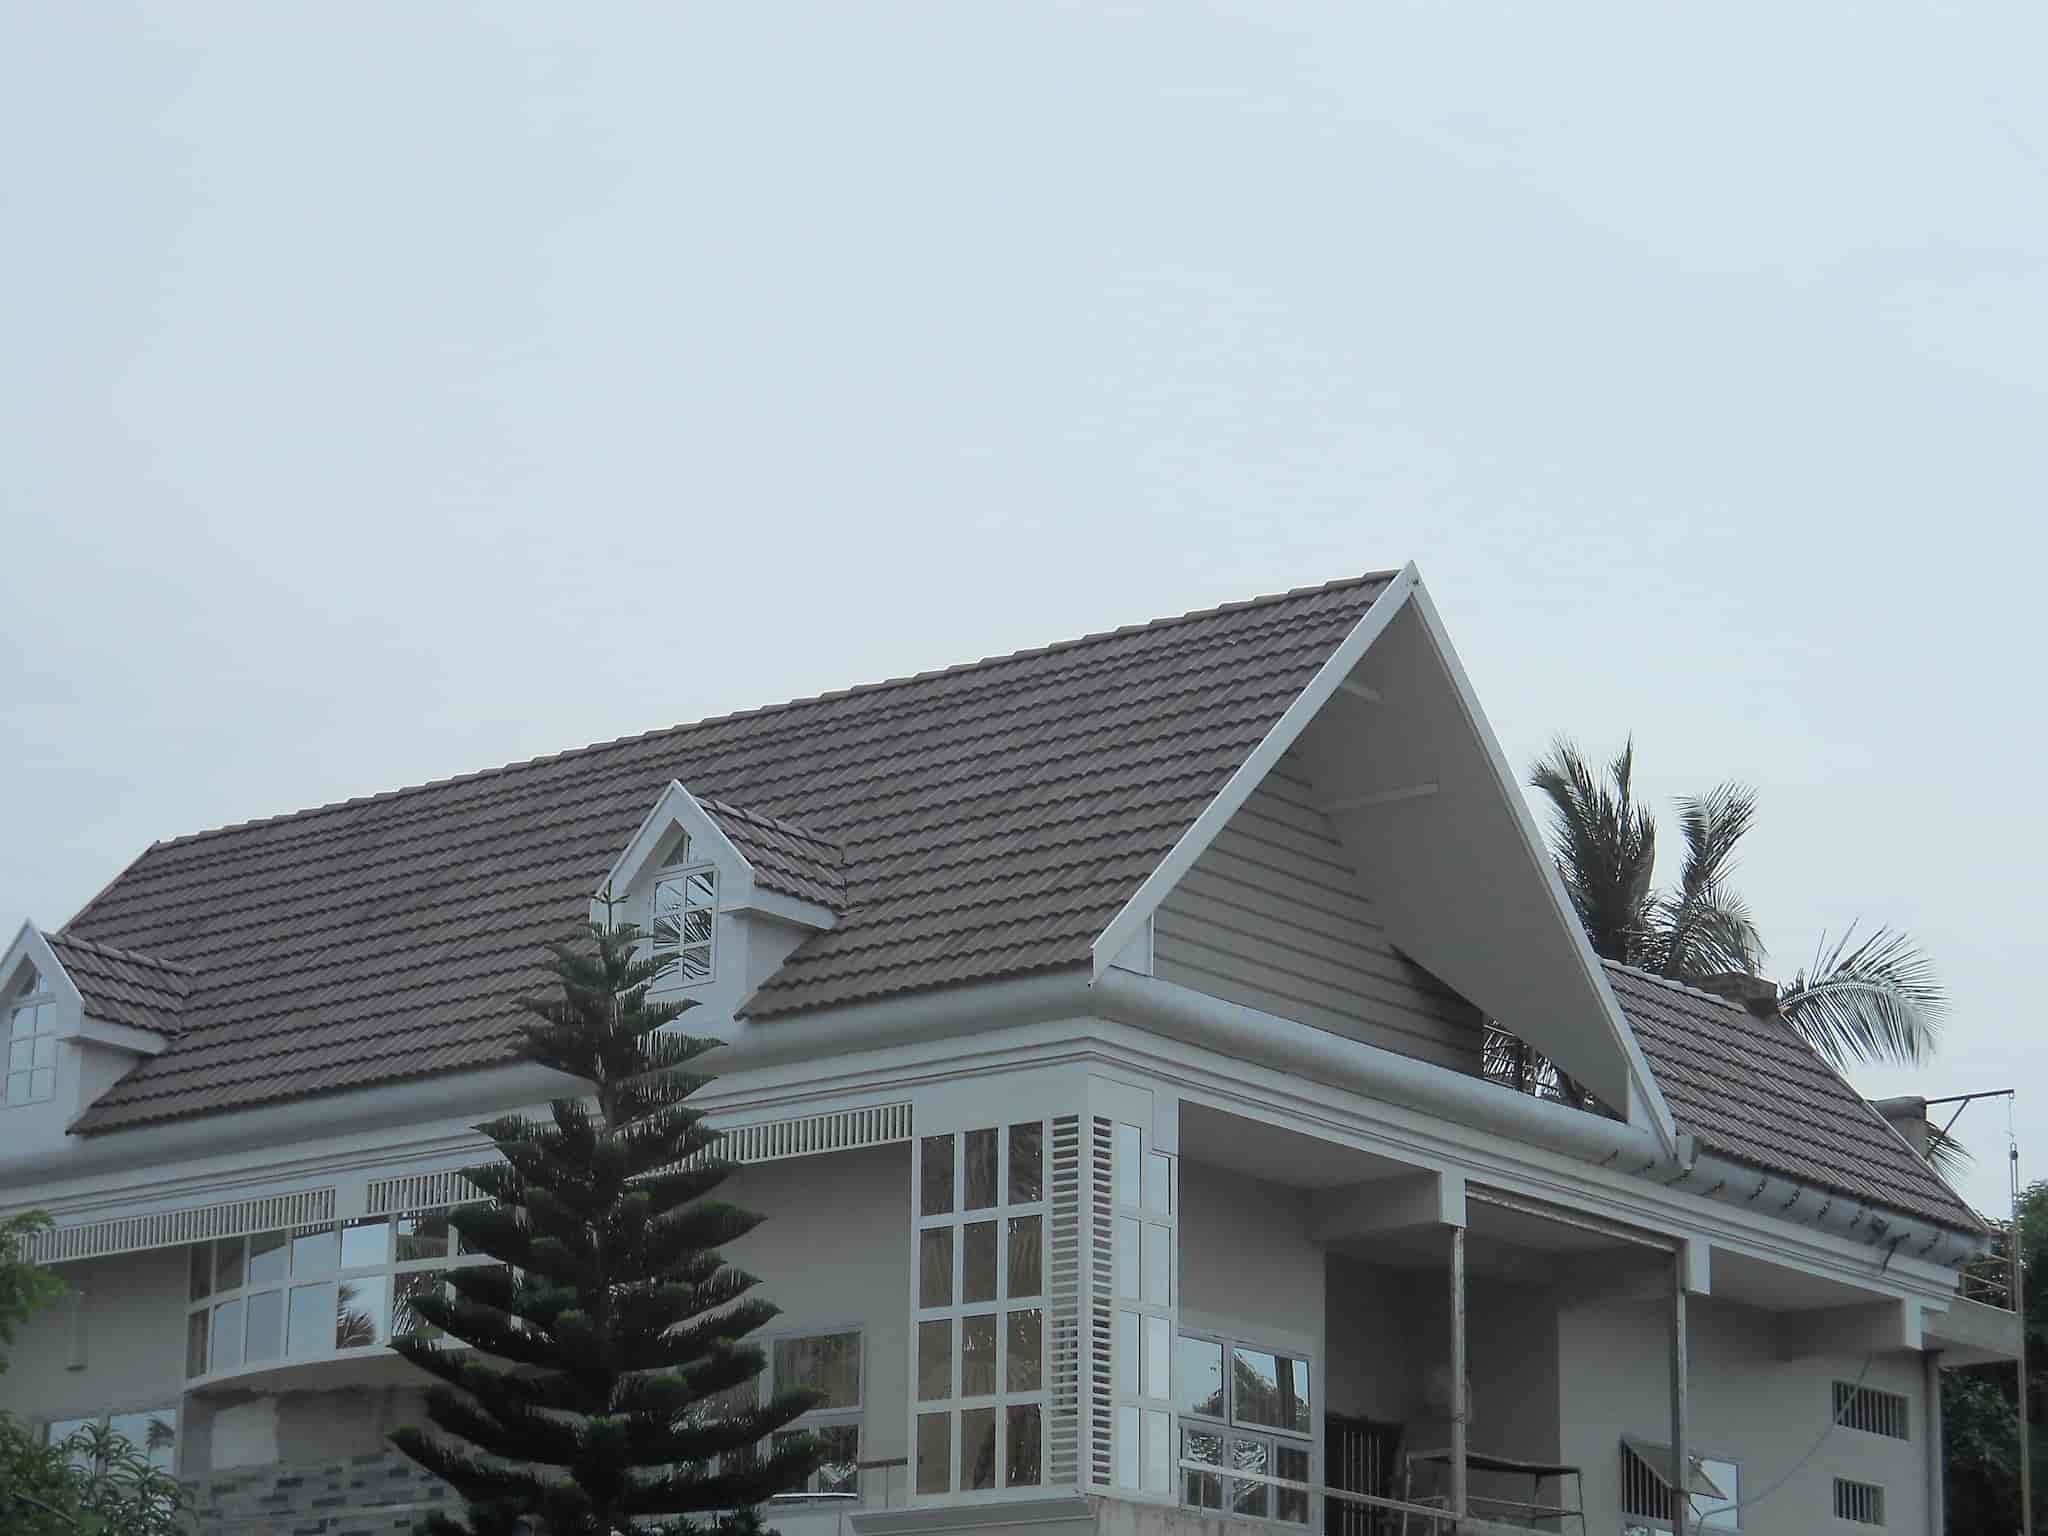 Roof Dark Grey Tiles Work Comtrust Super Designer Pvt Ltd Photos Olavakkot